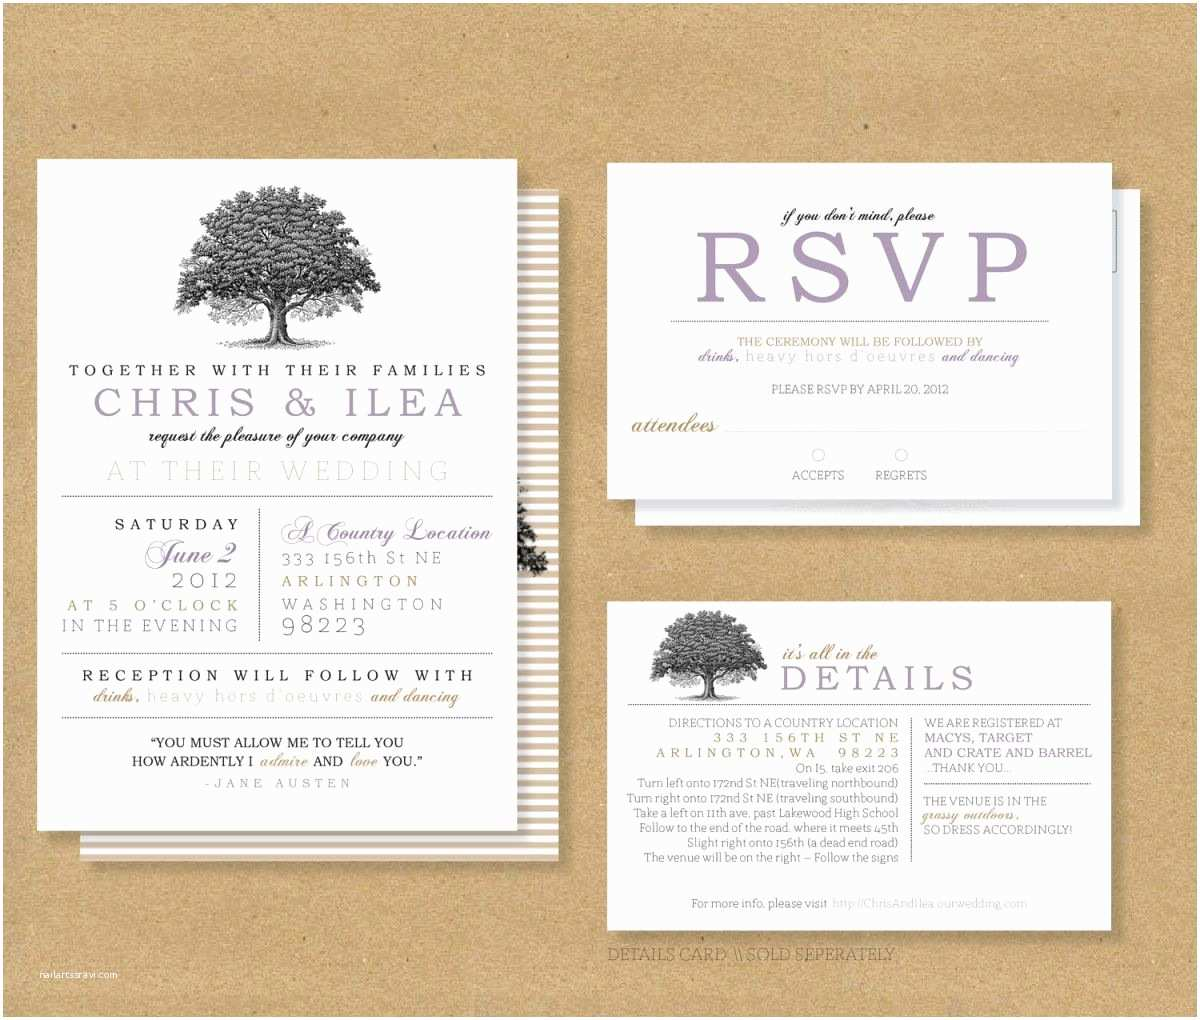 Wedding Invitation Text Wedding Invitation Rsvp Wording